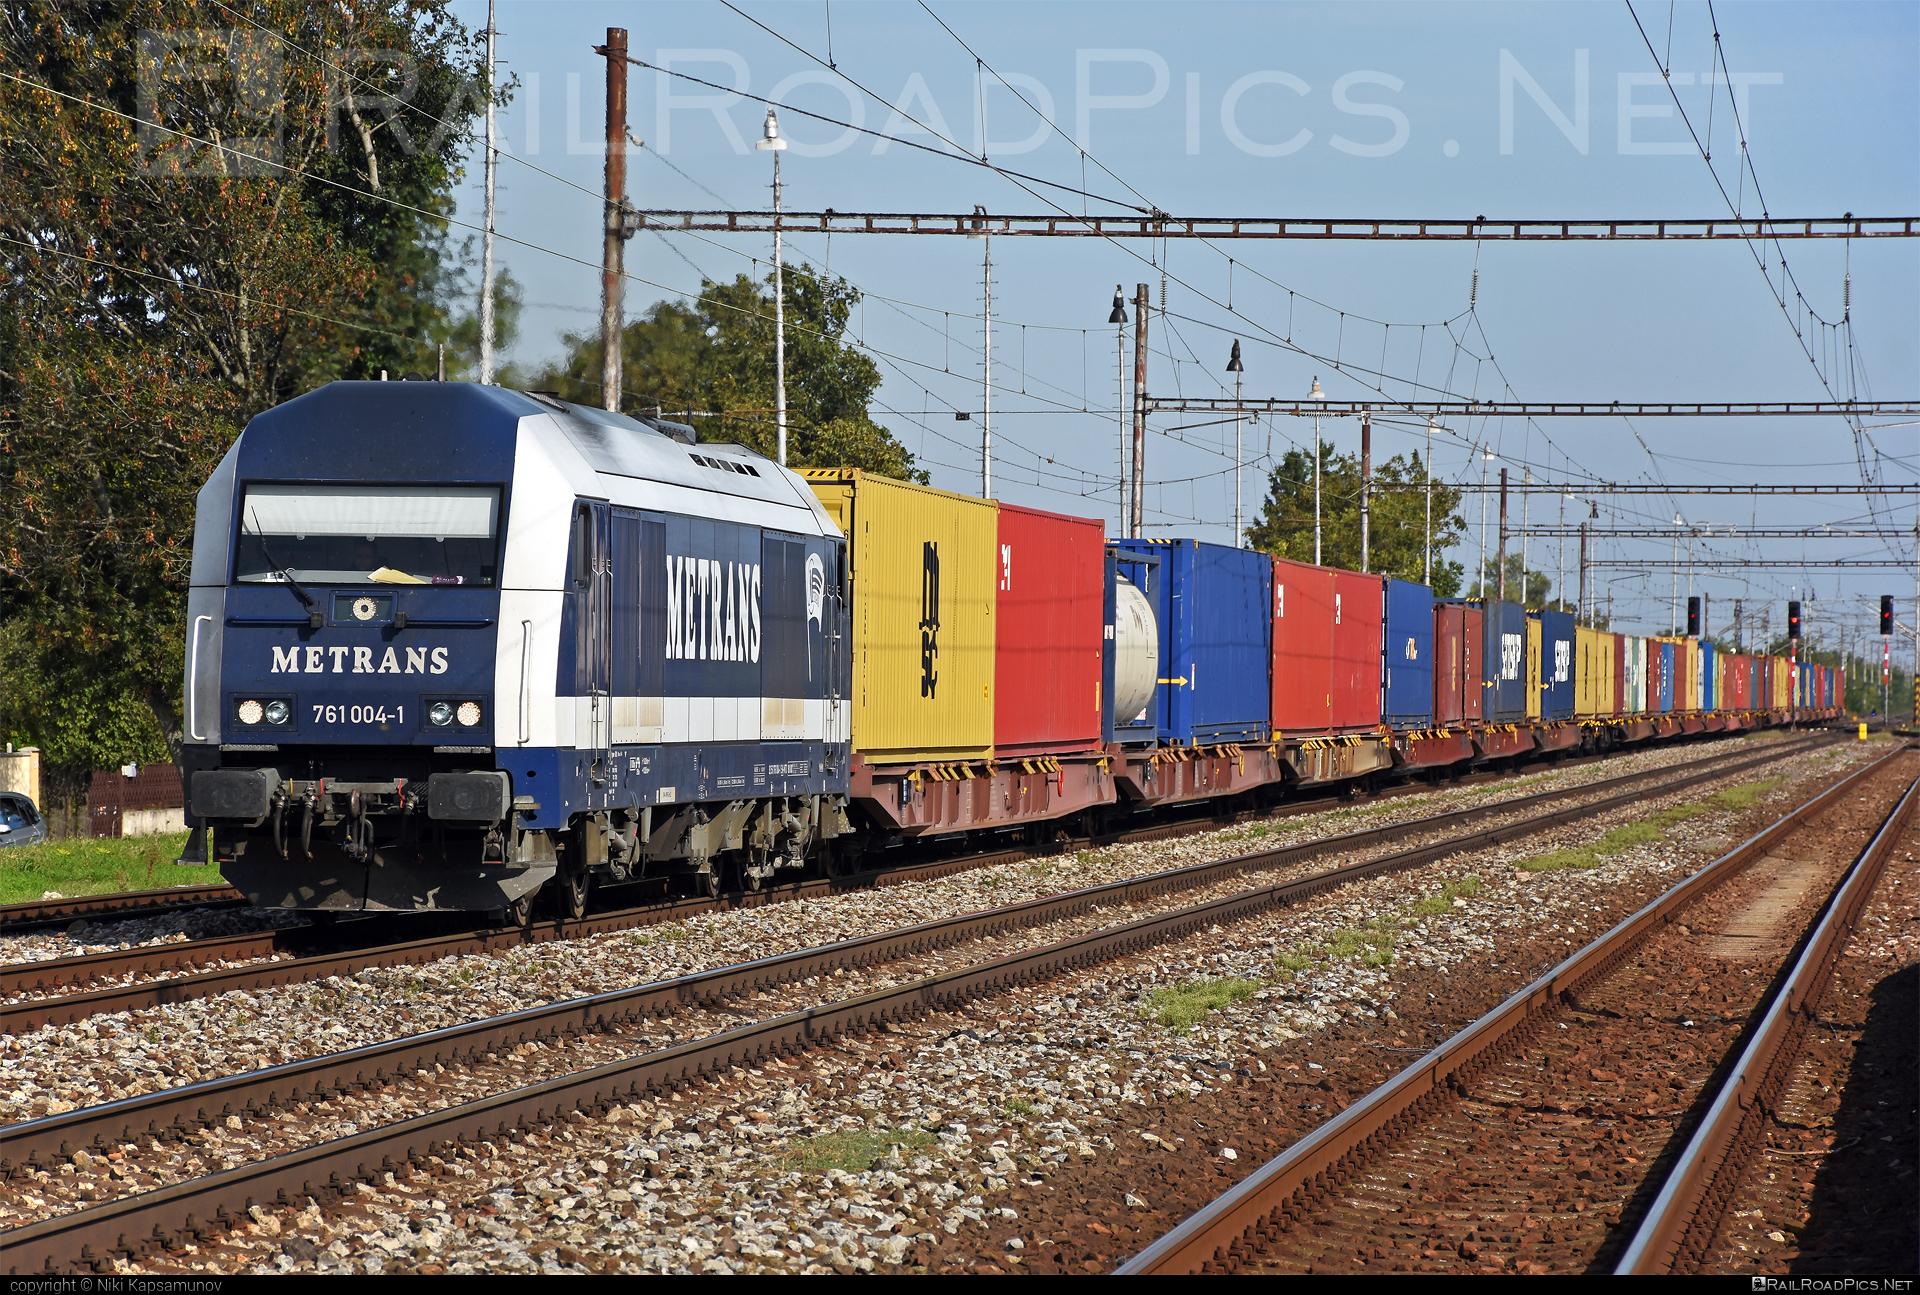 Siemens ER20 - 761 004-1 operated by METRANS (Danubia) a.s. #er20 #er20hercules #eurorunner #flatwagon #hercules #hhla #metrans #metransdanubia #siemens #siemenser20 #siemenser20hercules #siemenseurorunner #siemenshercules